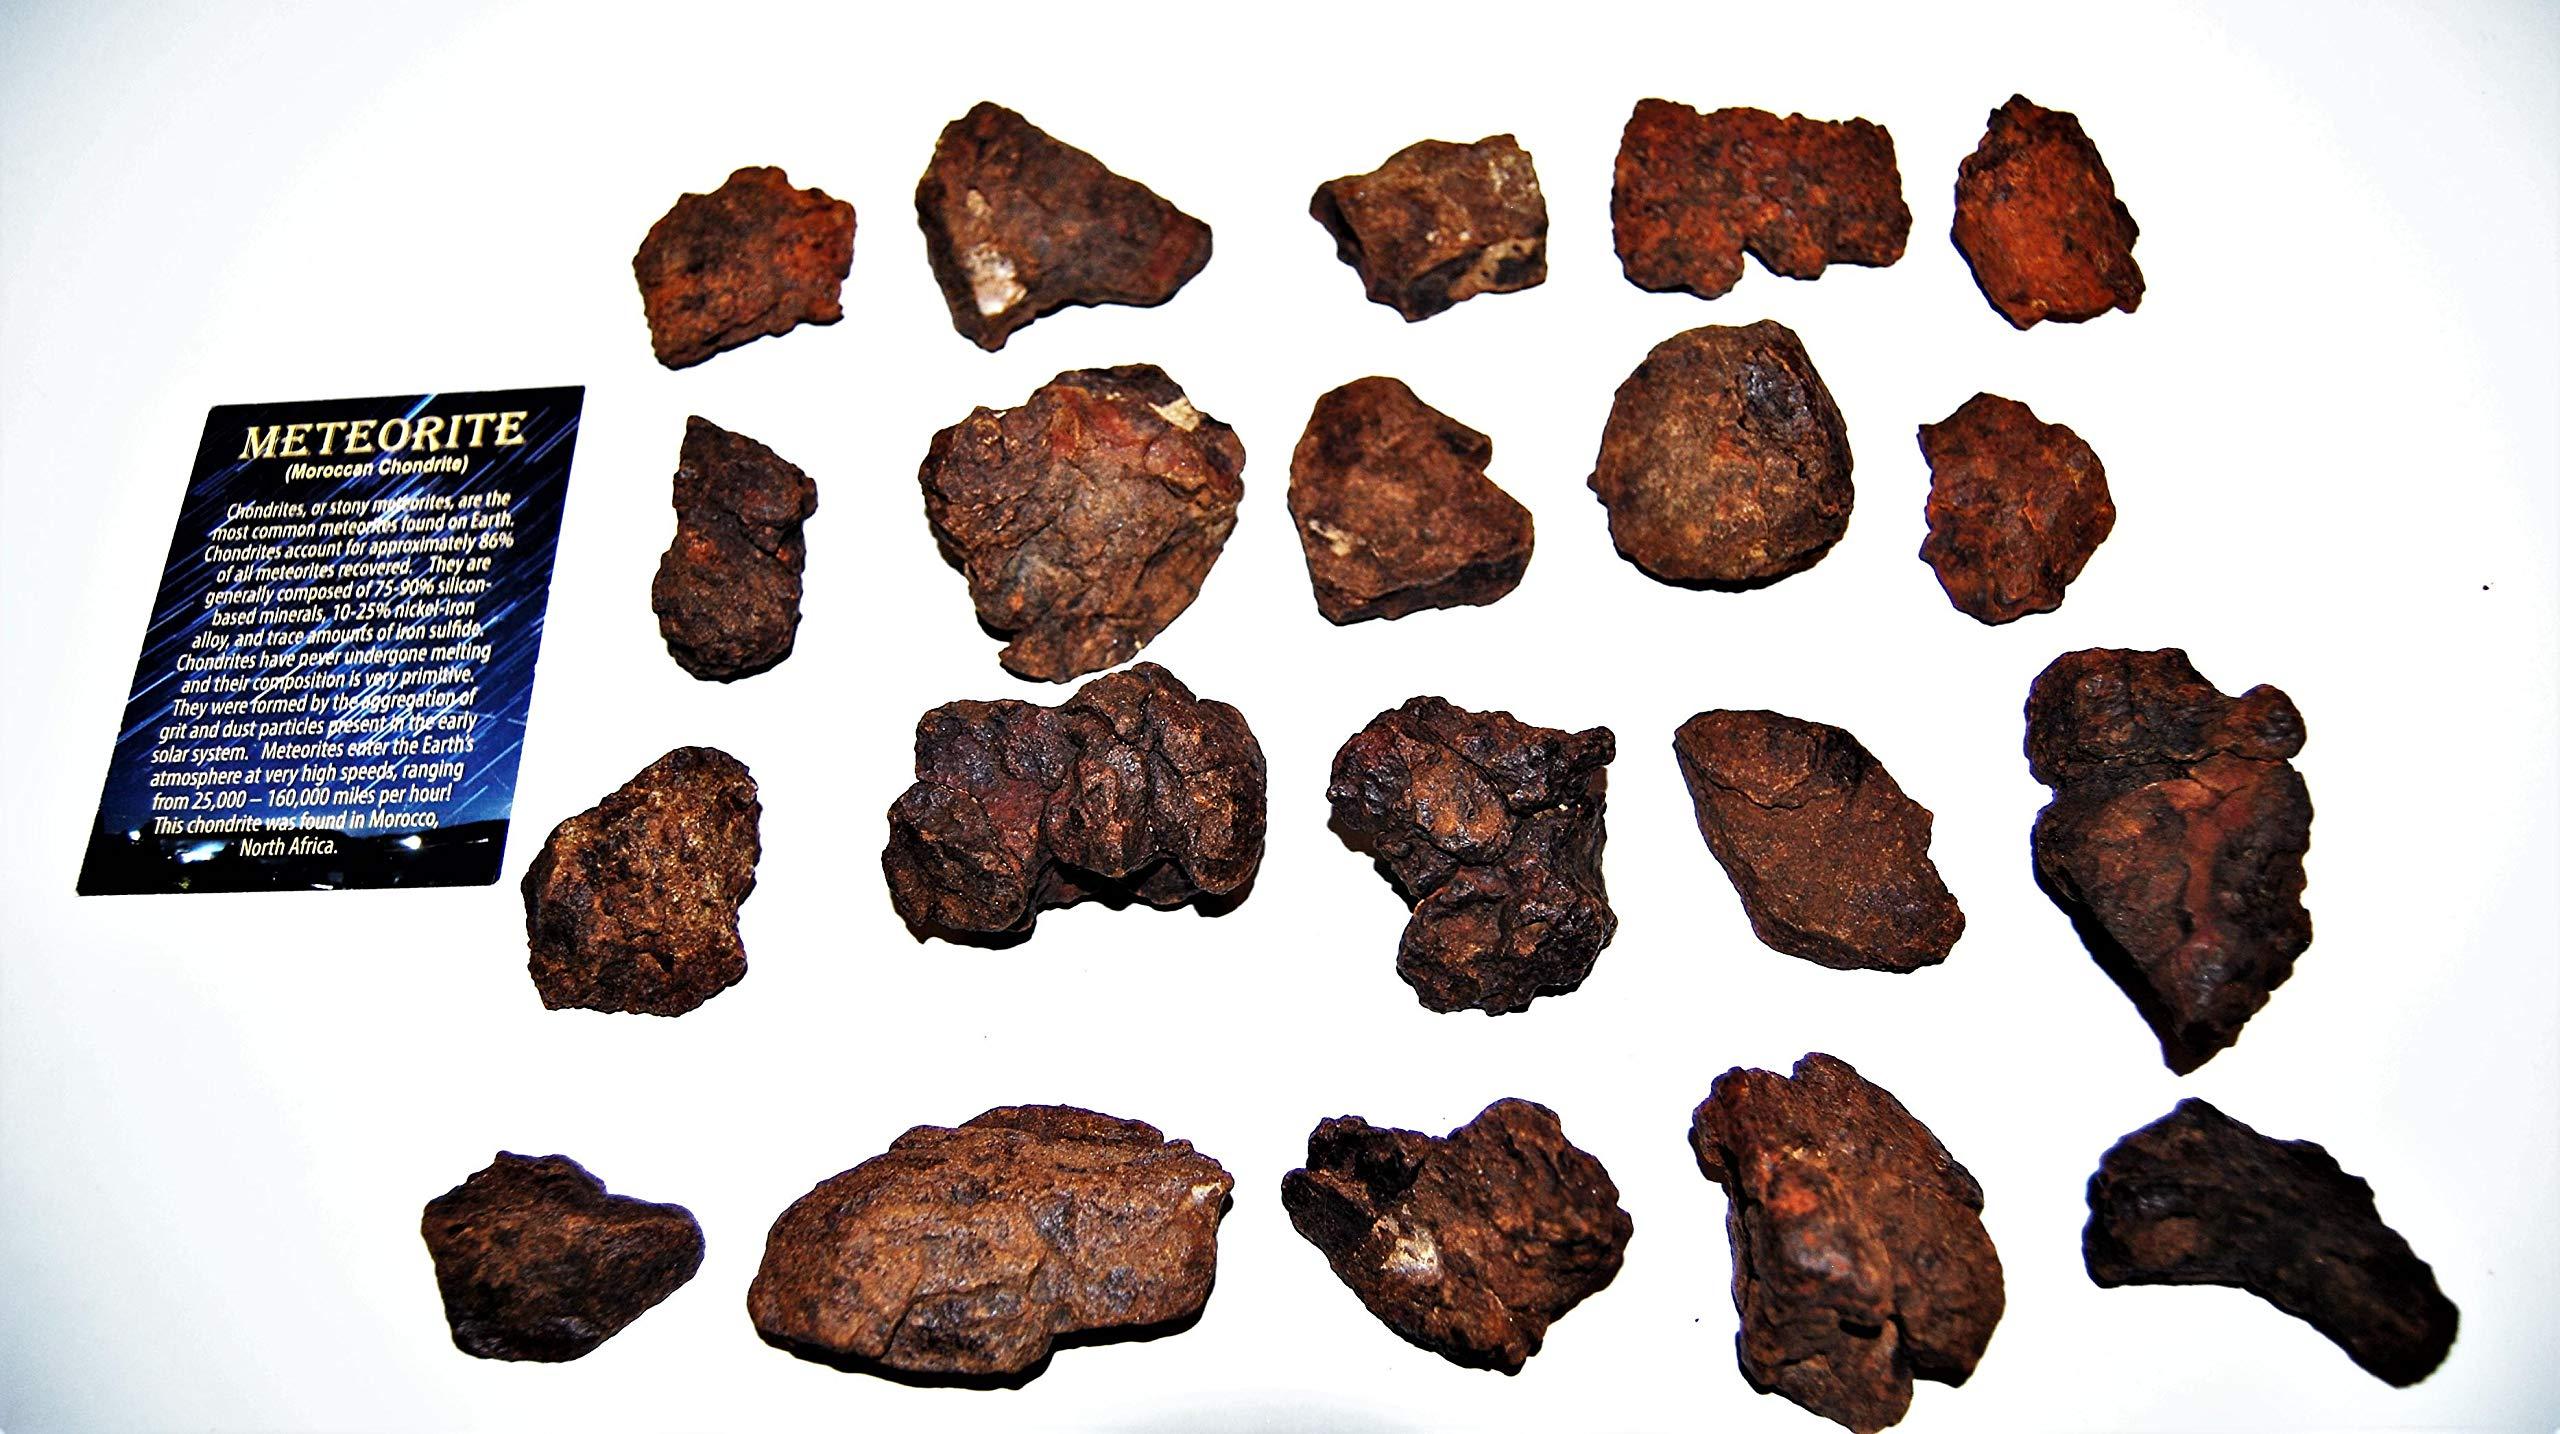 Fossils, Meteorites, & More Moroccan Chondrite Stony Meteorite Large B Grade Lot 1000 Grams